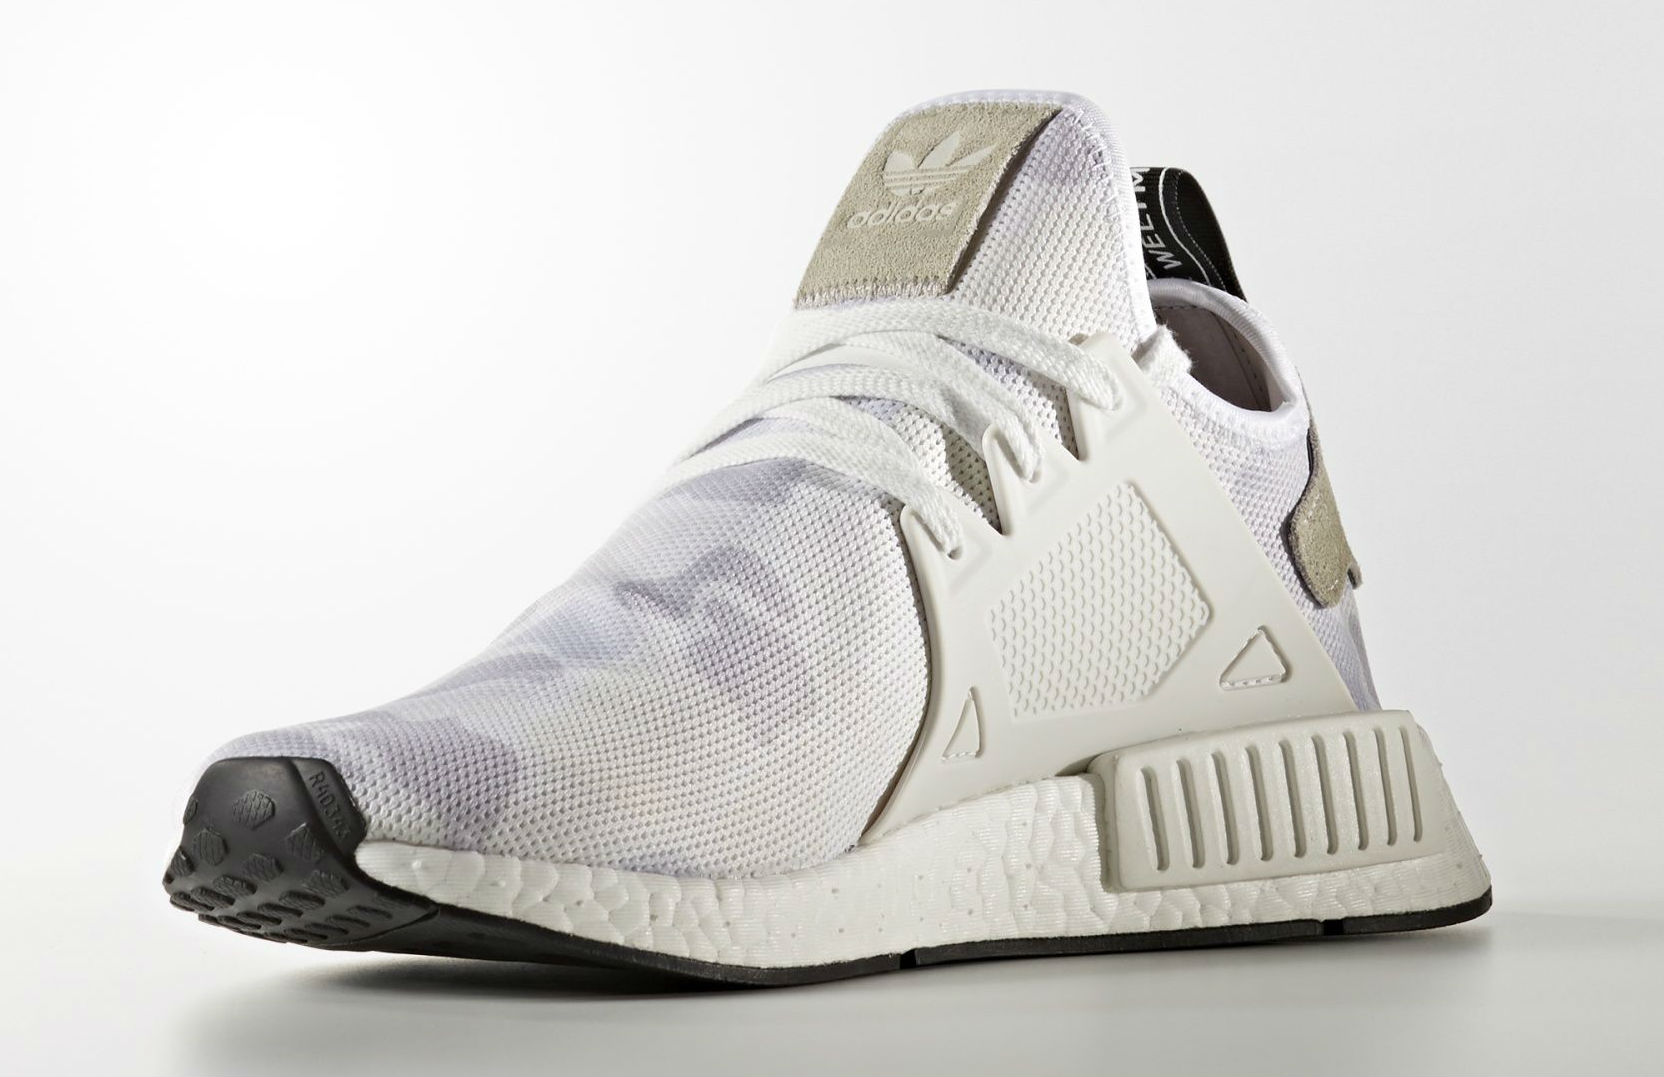 Adidas Nmd White Camo